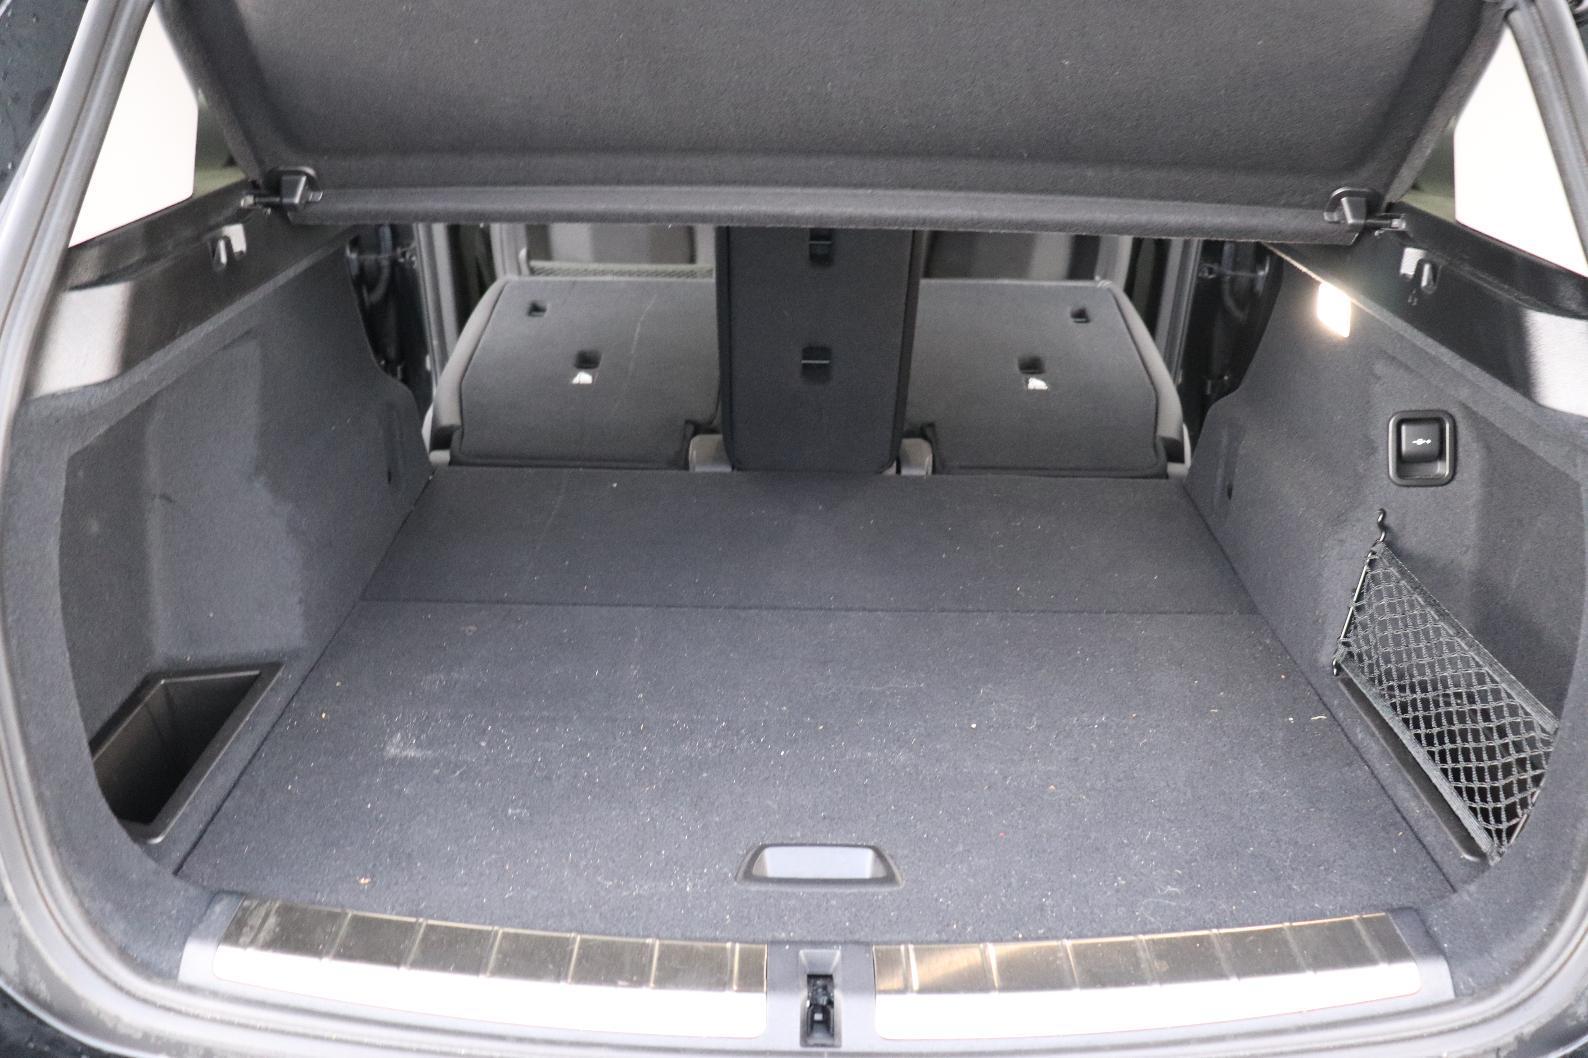 BMW X1 F48 LCI X1 xDrive 20d 190 ch BVA8 xLine